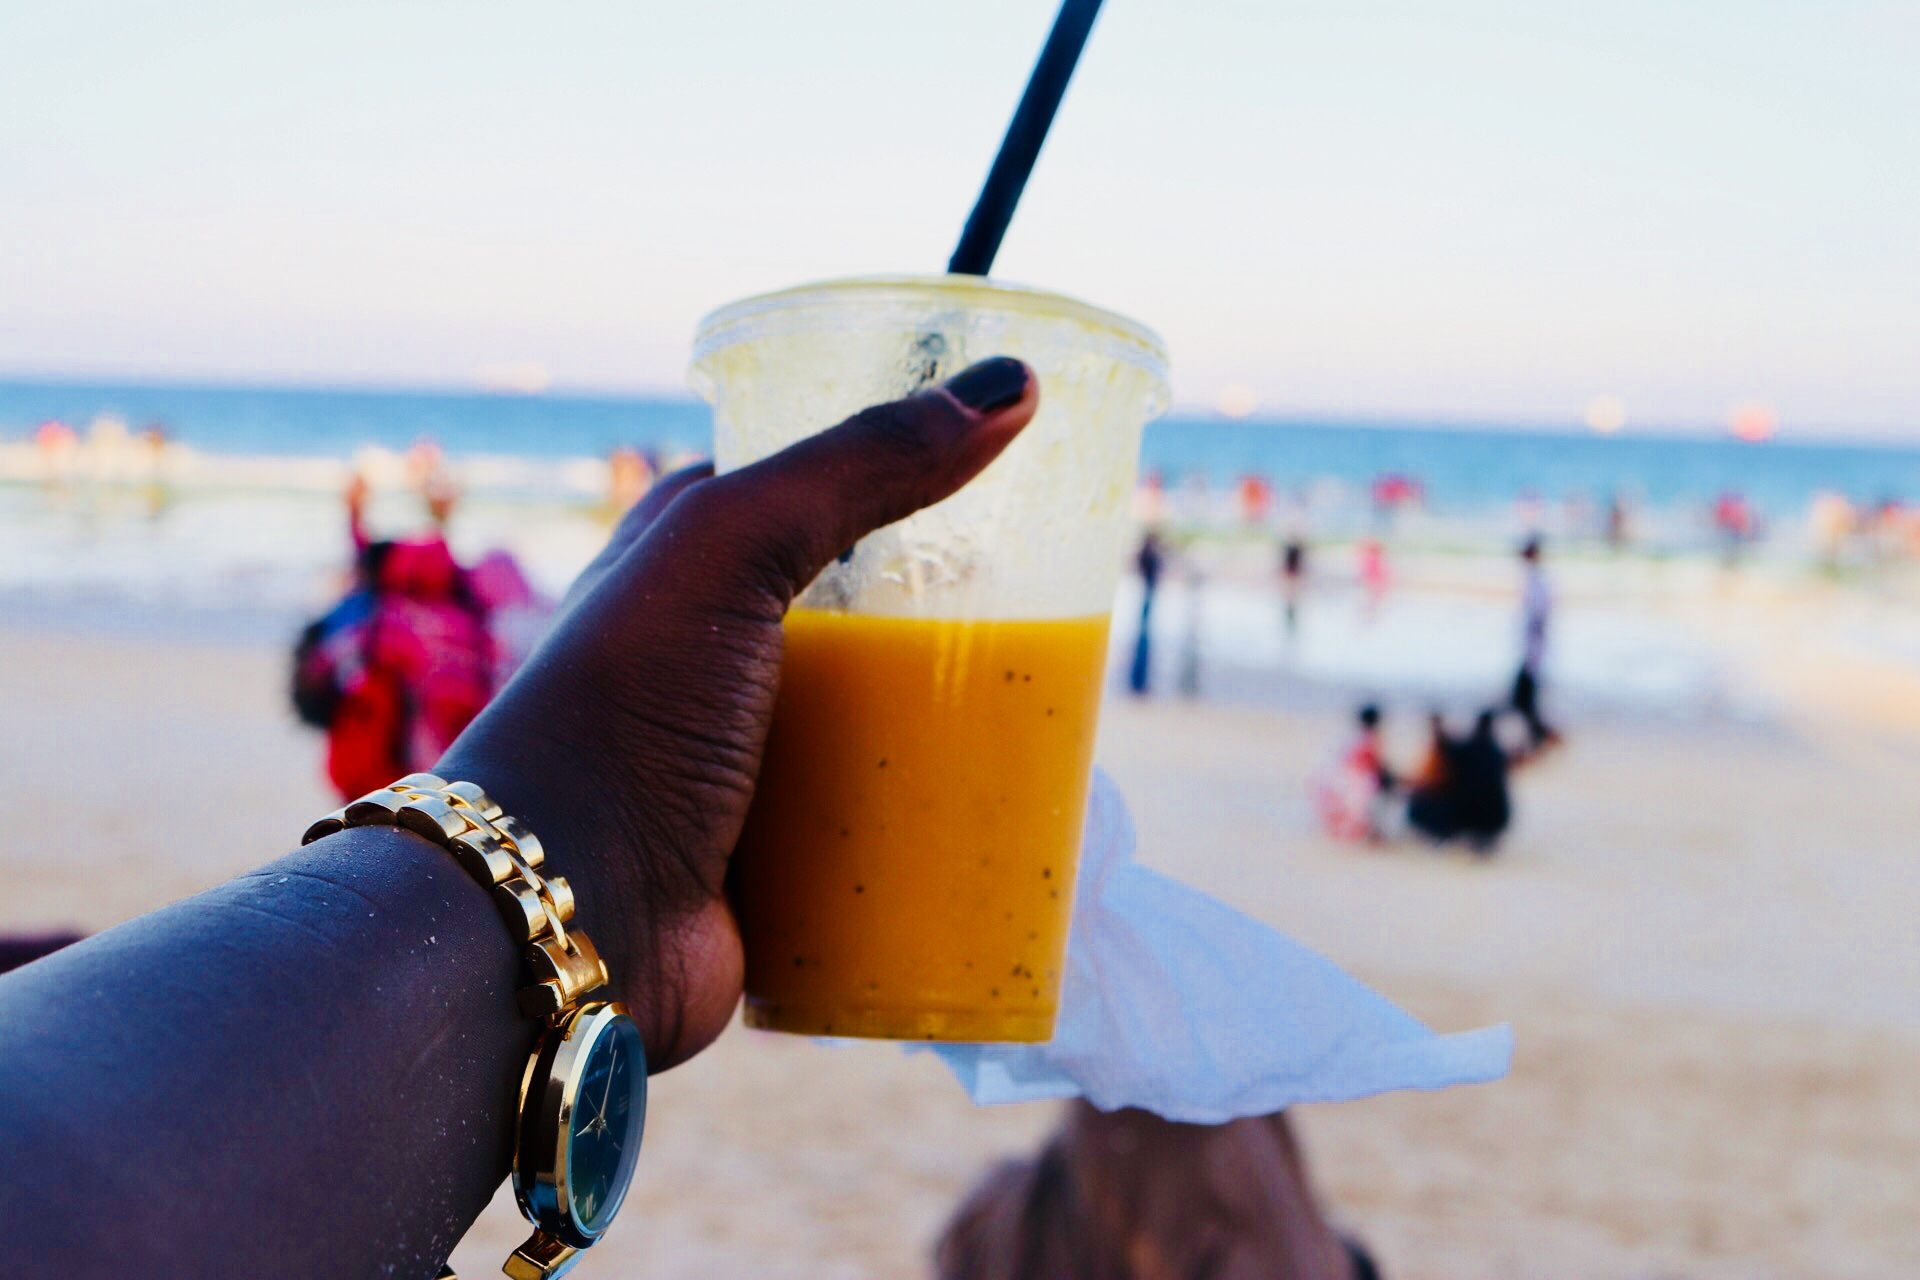 The best juice in Dar es Salaam! That @Makjuice_tz mix yo! It's life! - Coco Beach, Dar es Salaam, Tanzania